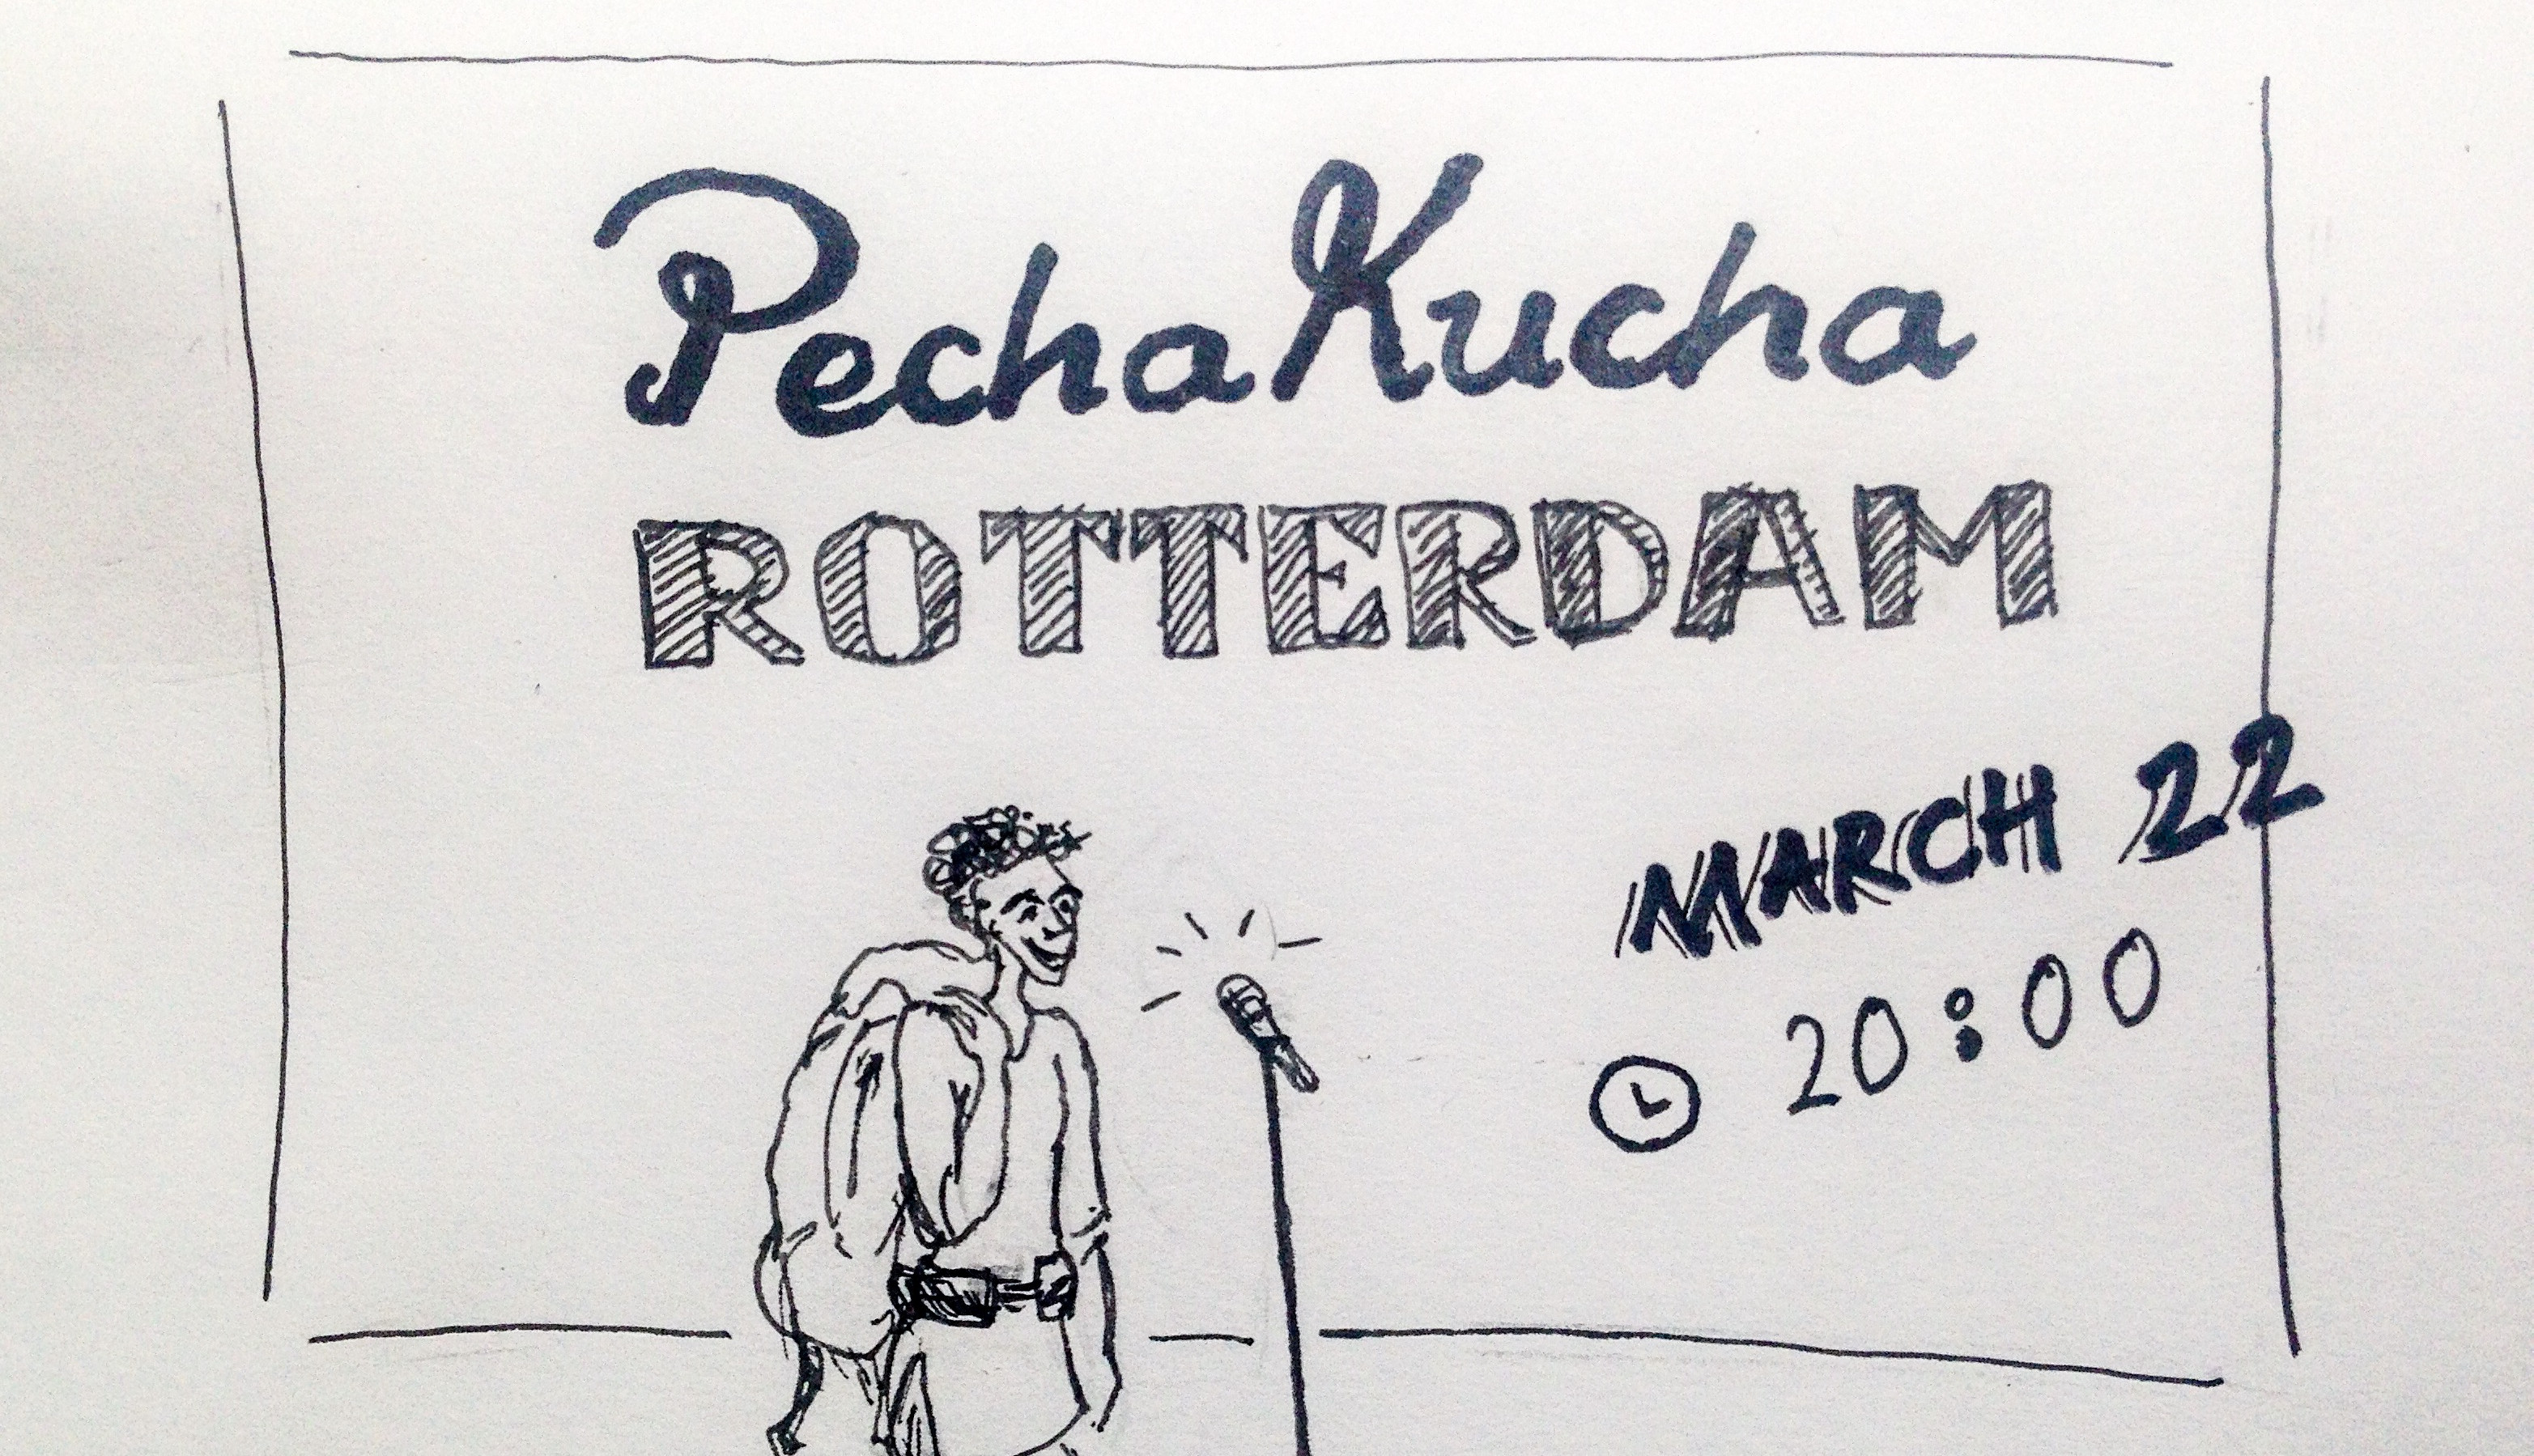 Pecha Kucha Rotterdam Netherlands Lilian Leahy inspirational speaker travel low bodget shoestring bartering trading exchange art skills illustrations sign painting march 22 2016 Arminius Museumpark